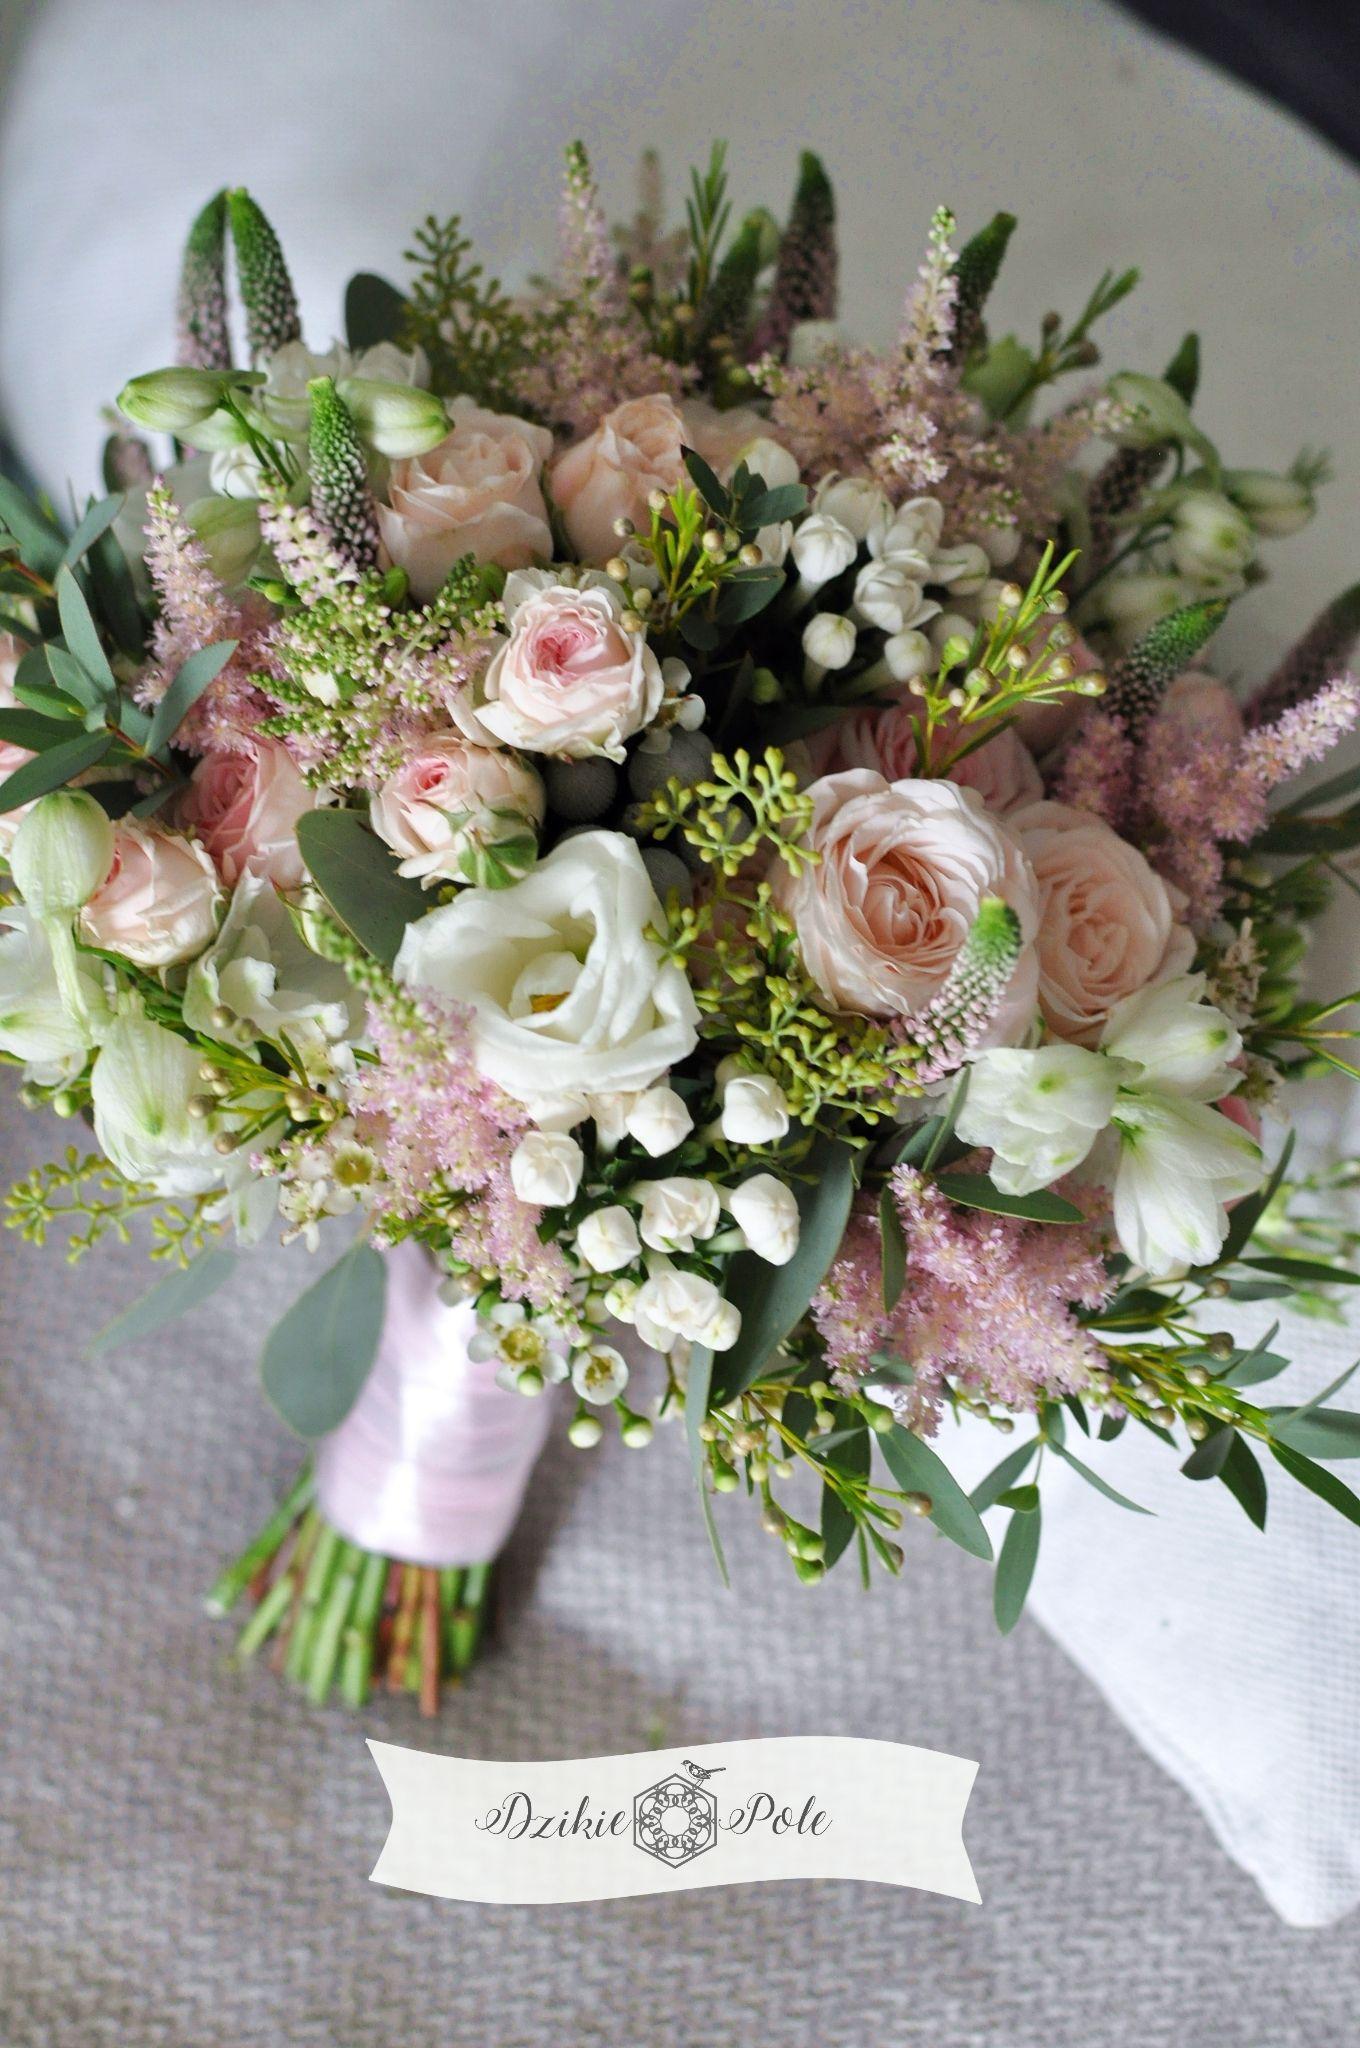 Rustykalny Bukiet Slubny Eustoma Roza Tawulka Rustykalny Slub Rustic Wedding Bouquet Wedding Bouquets Floral Event Design Bouquet